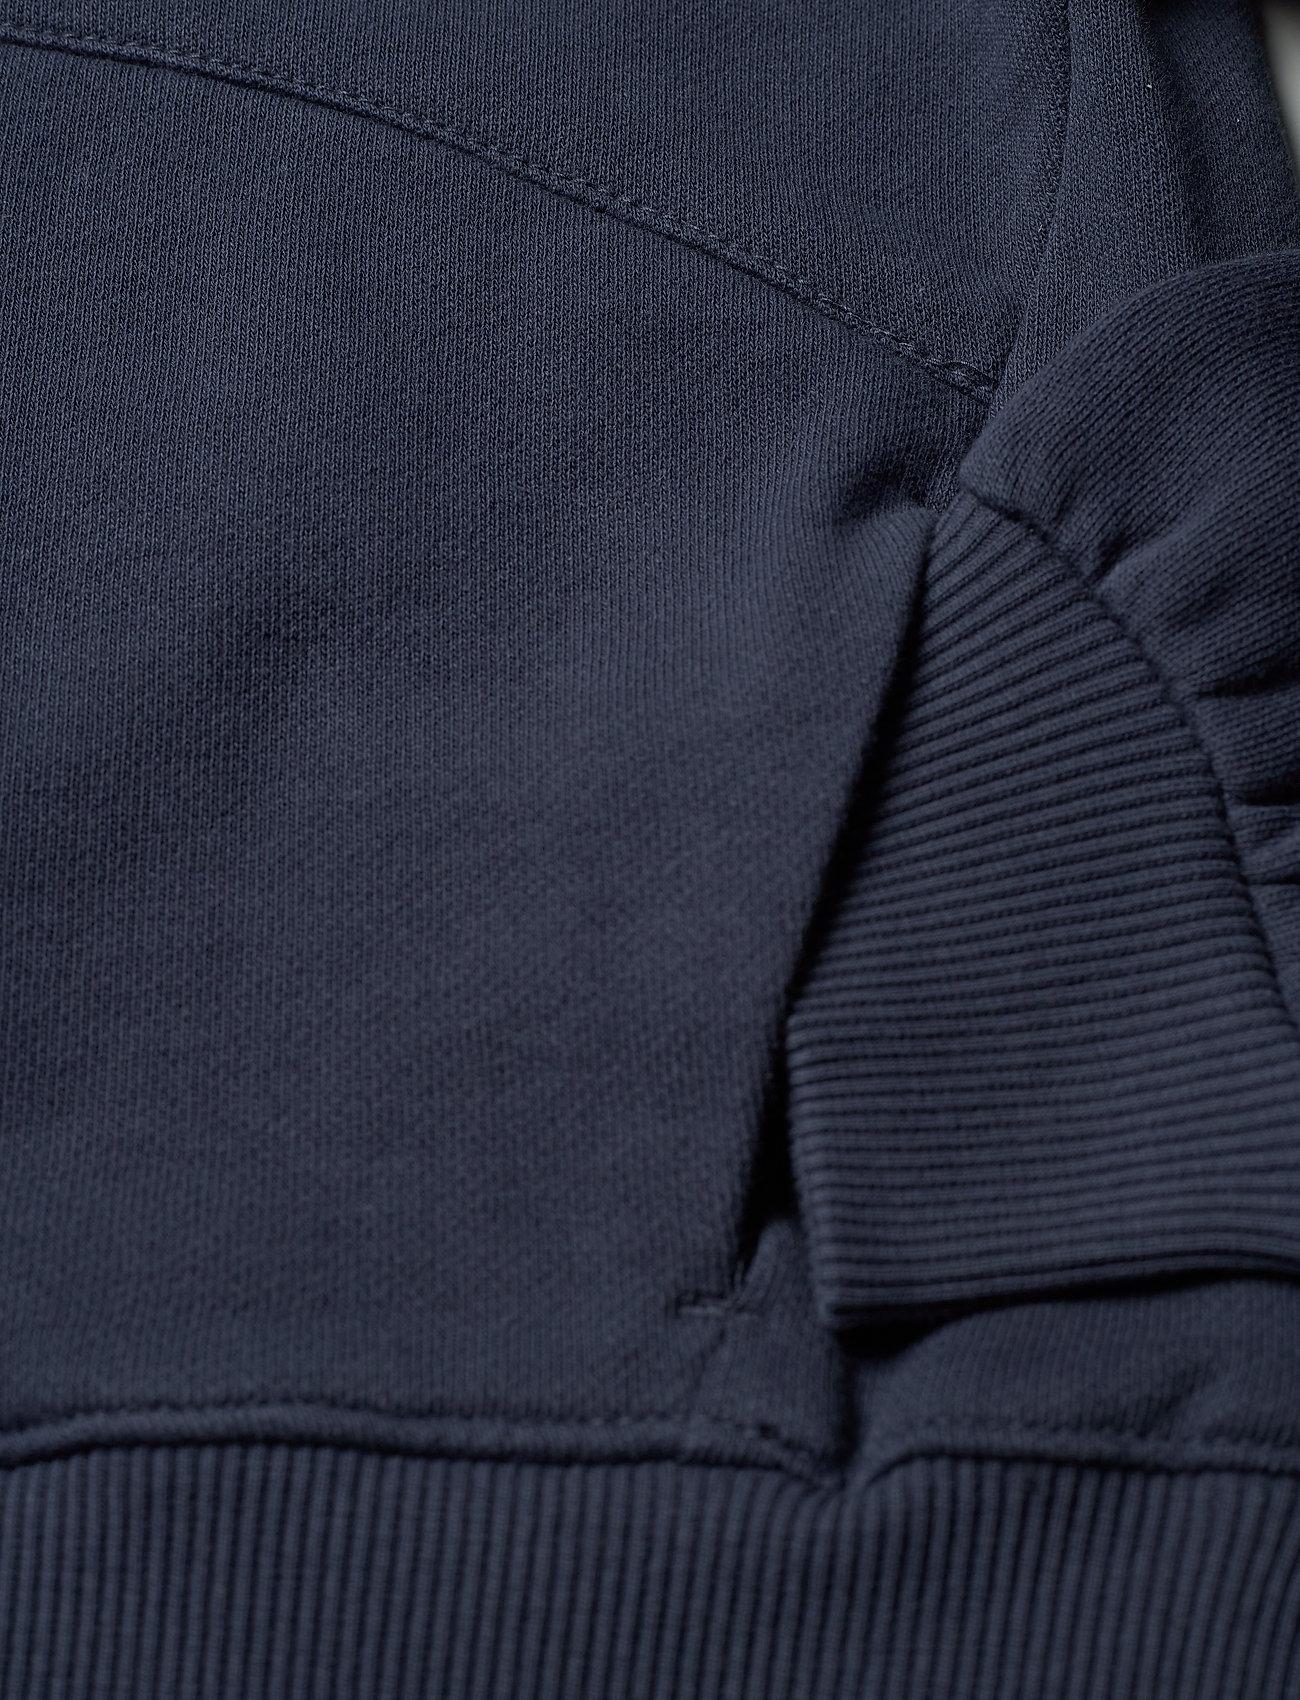 Tommy Hilfiger - ESSENTIAL SWEATSHIRT - sweatshirts - twilight navy - 3